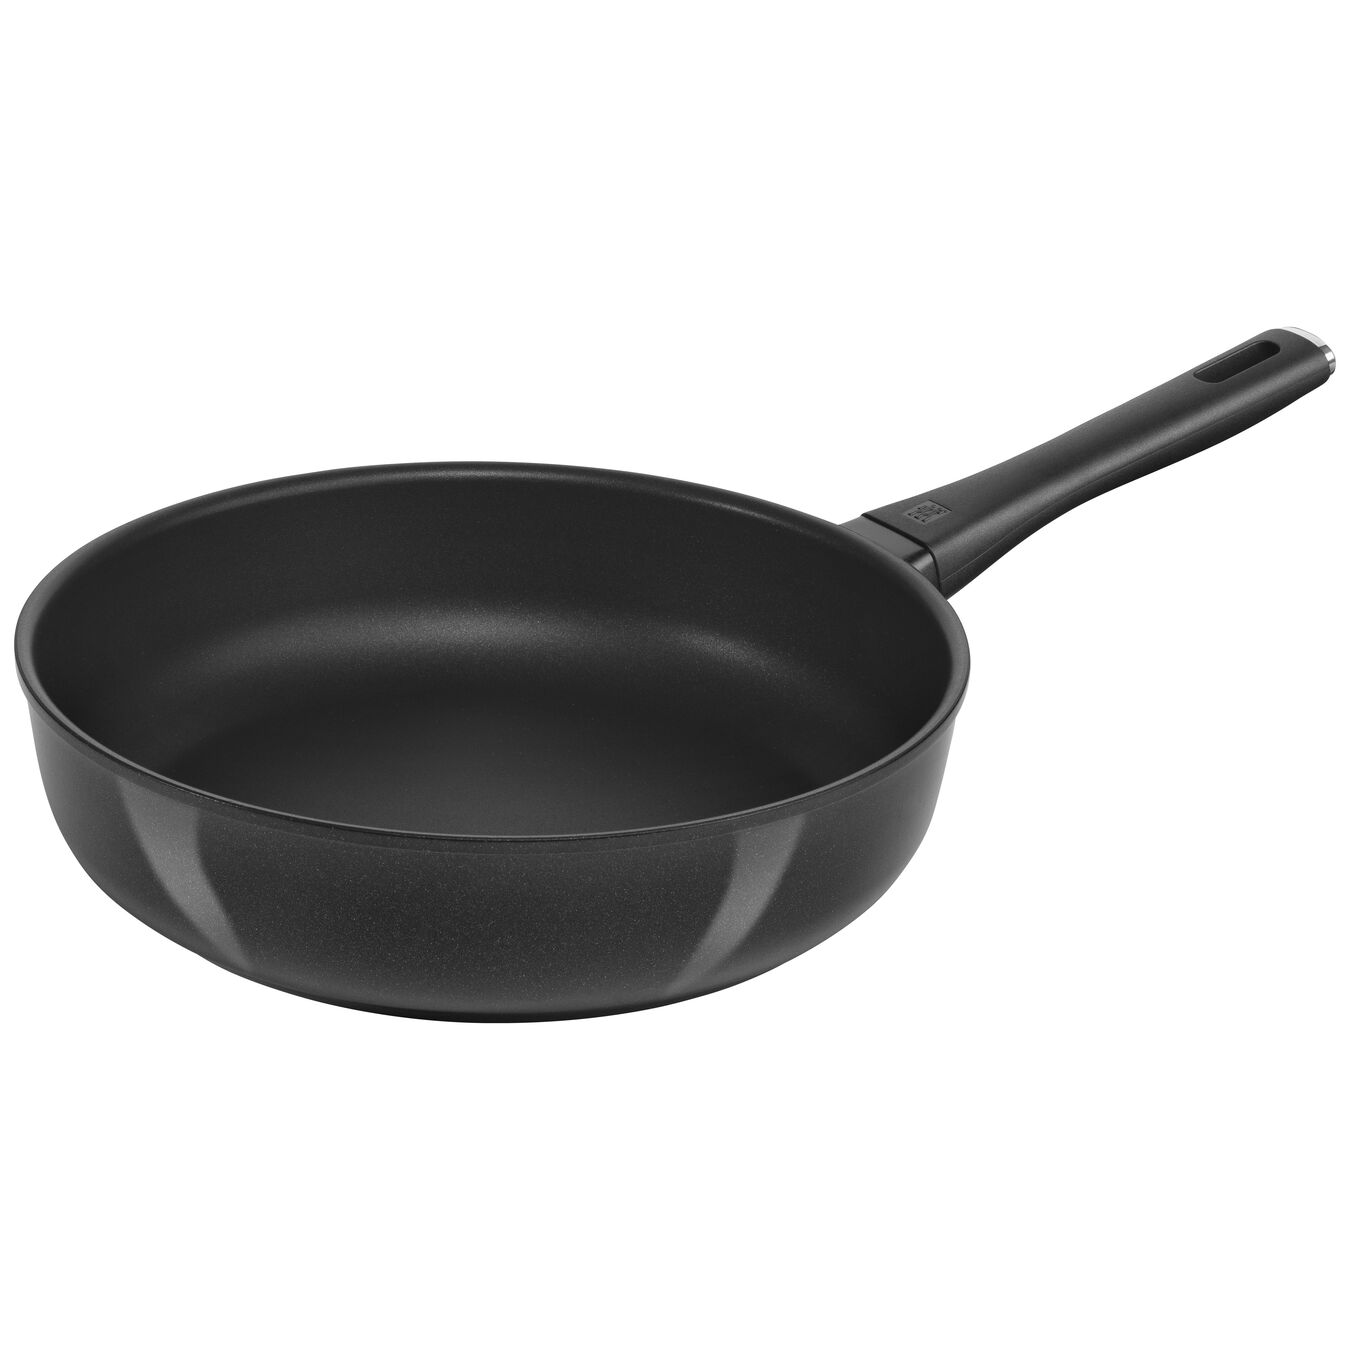 28 cm / 11 inch aluminium Frying pan high-sided,,large 1